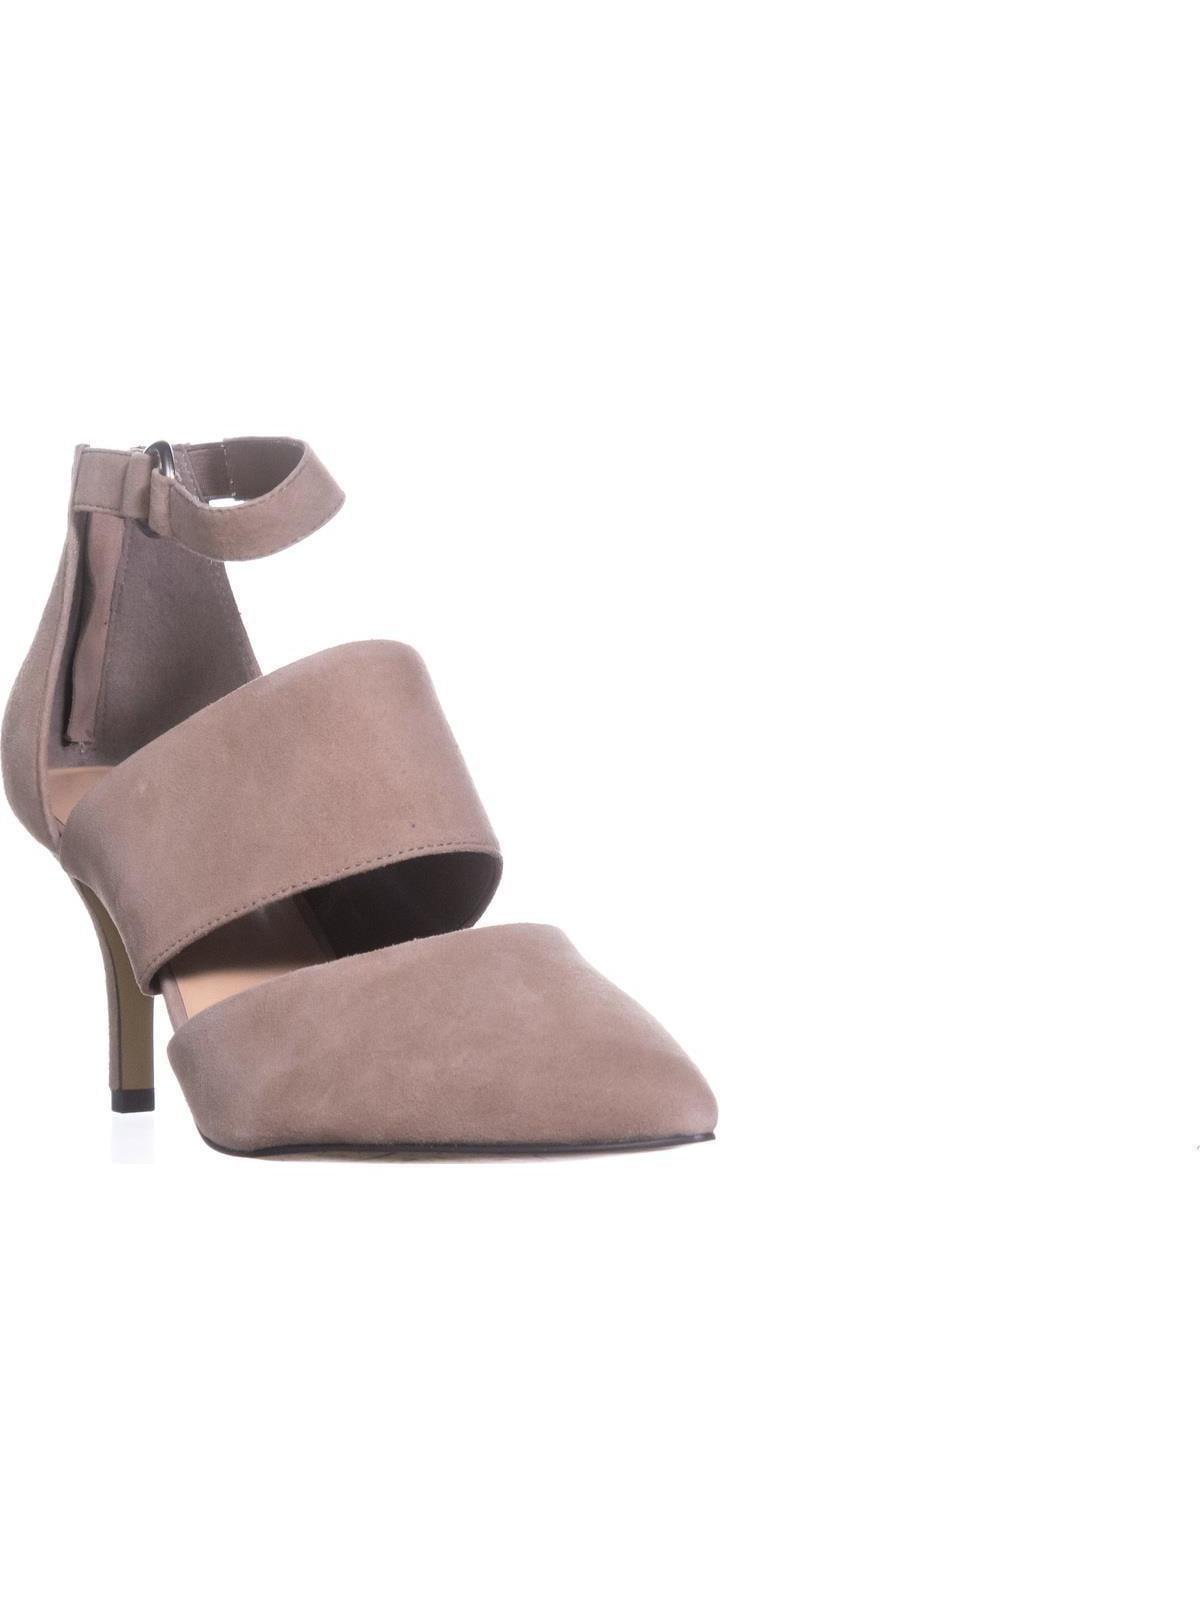 Womens Bella Vita Diana Ankle Strap Pumps, Almond by Bella Vita